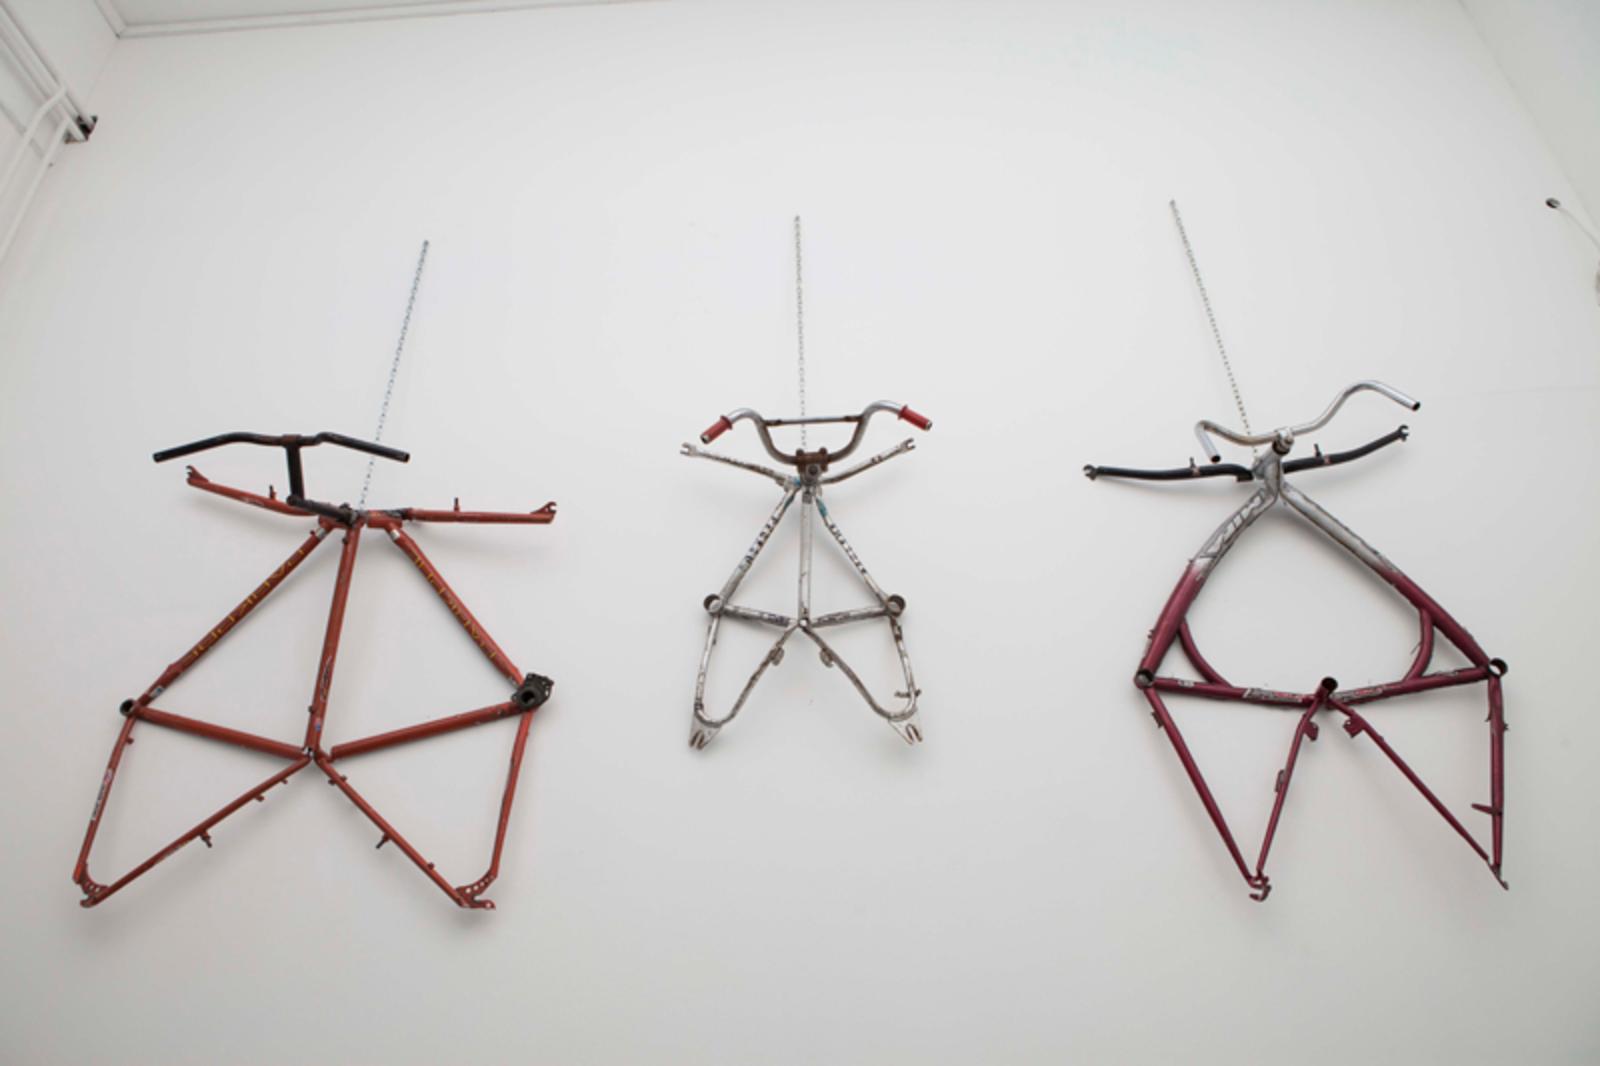 #underthestars, curated by_Maja & Reuben Fowkes, TIBOR HORVÁTH, Bicycle Family Suits, 2014, installation, dimensions variable, Photo: Andrea Gáldi Vinkó, Courtesy: acb gálerie Budapest